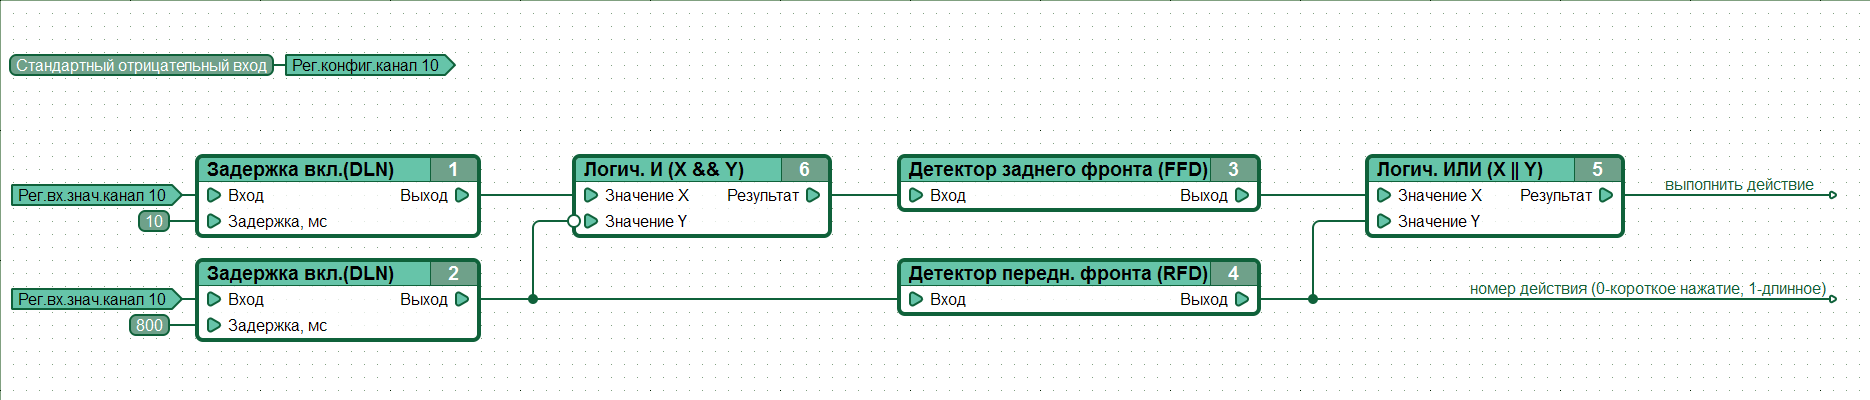 http://forum.canny.ru/files/oldpic/b5a4afa8-83d8-4d00-a2cc-4a1f0af57fa9.png